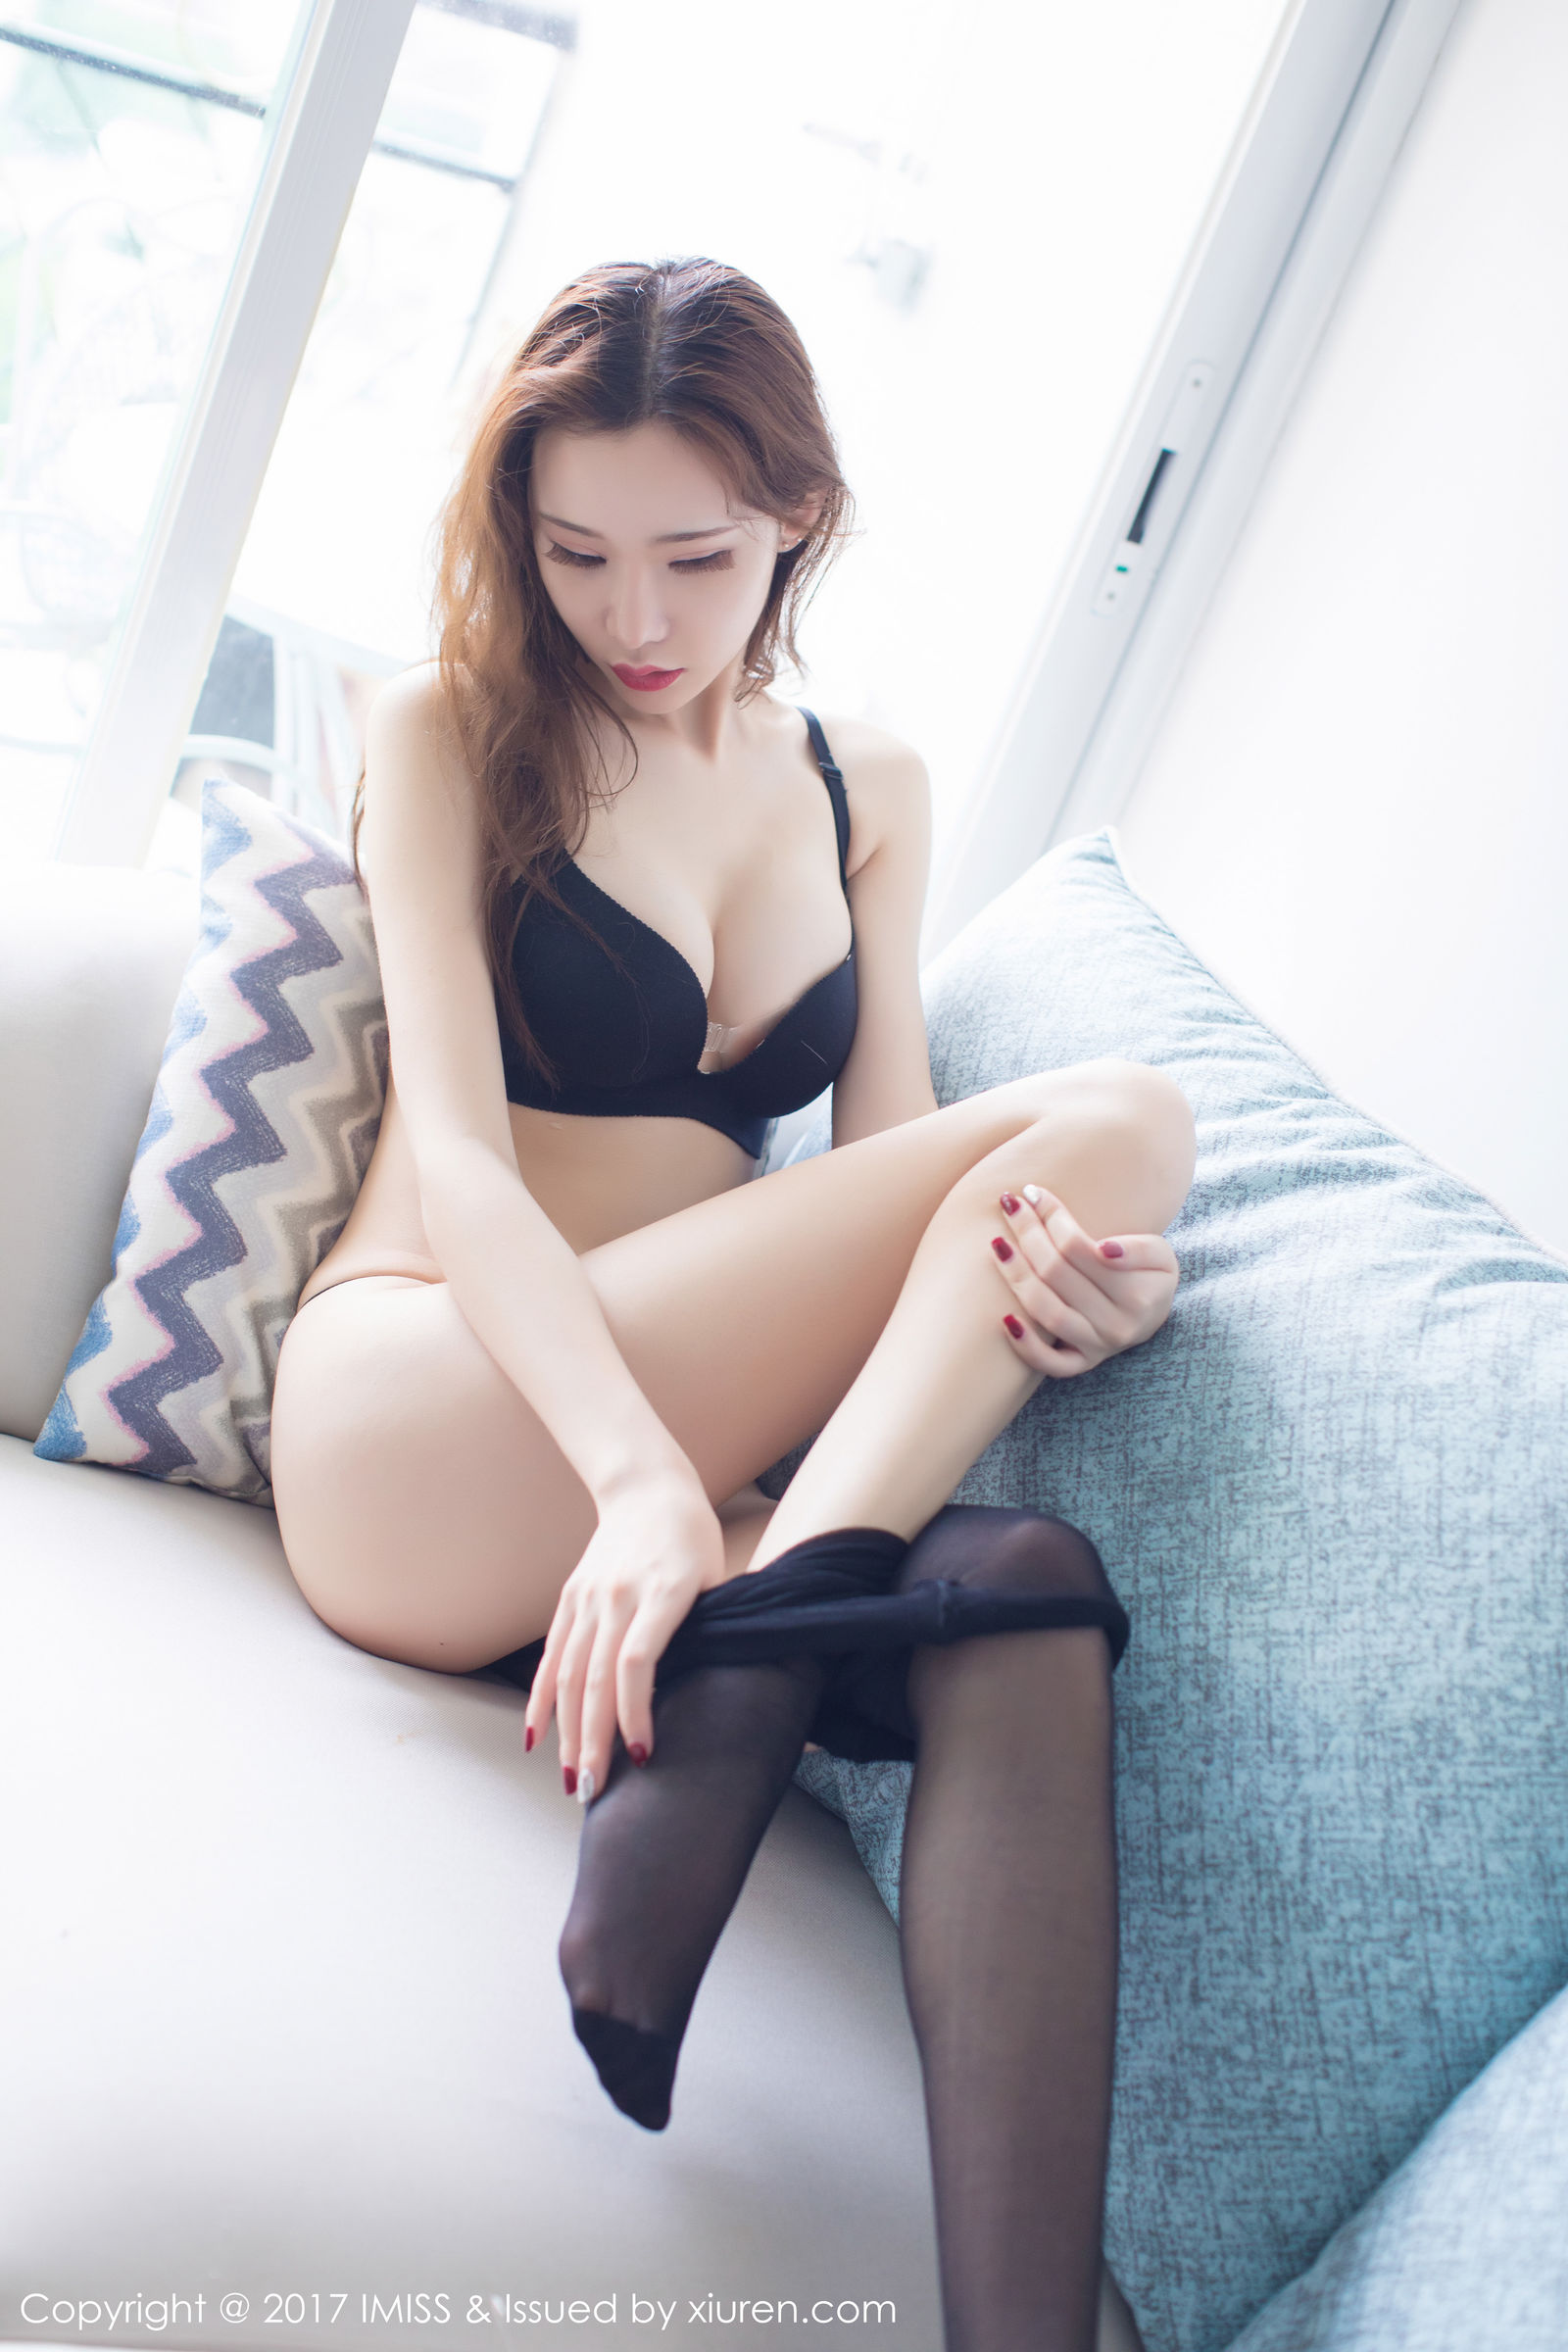 christina aguilera hot porn